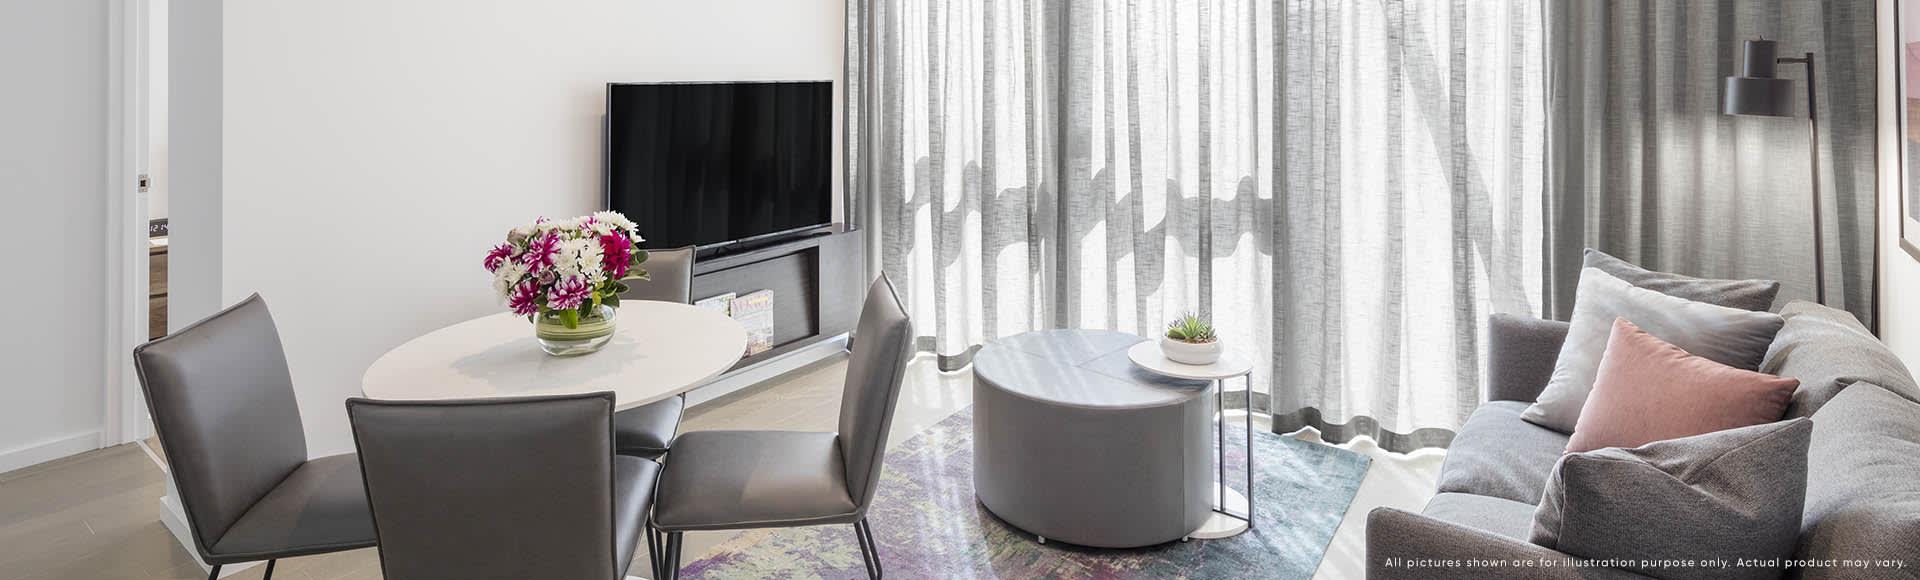 Avani Box Hill 1 Bedroom Suite Lounge 1920x580px